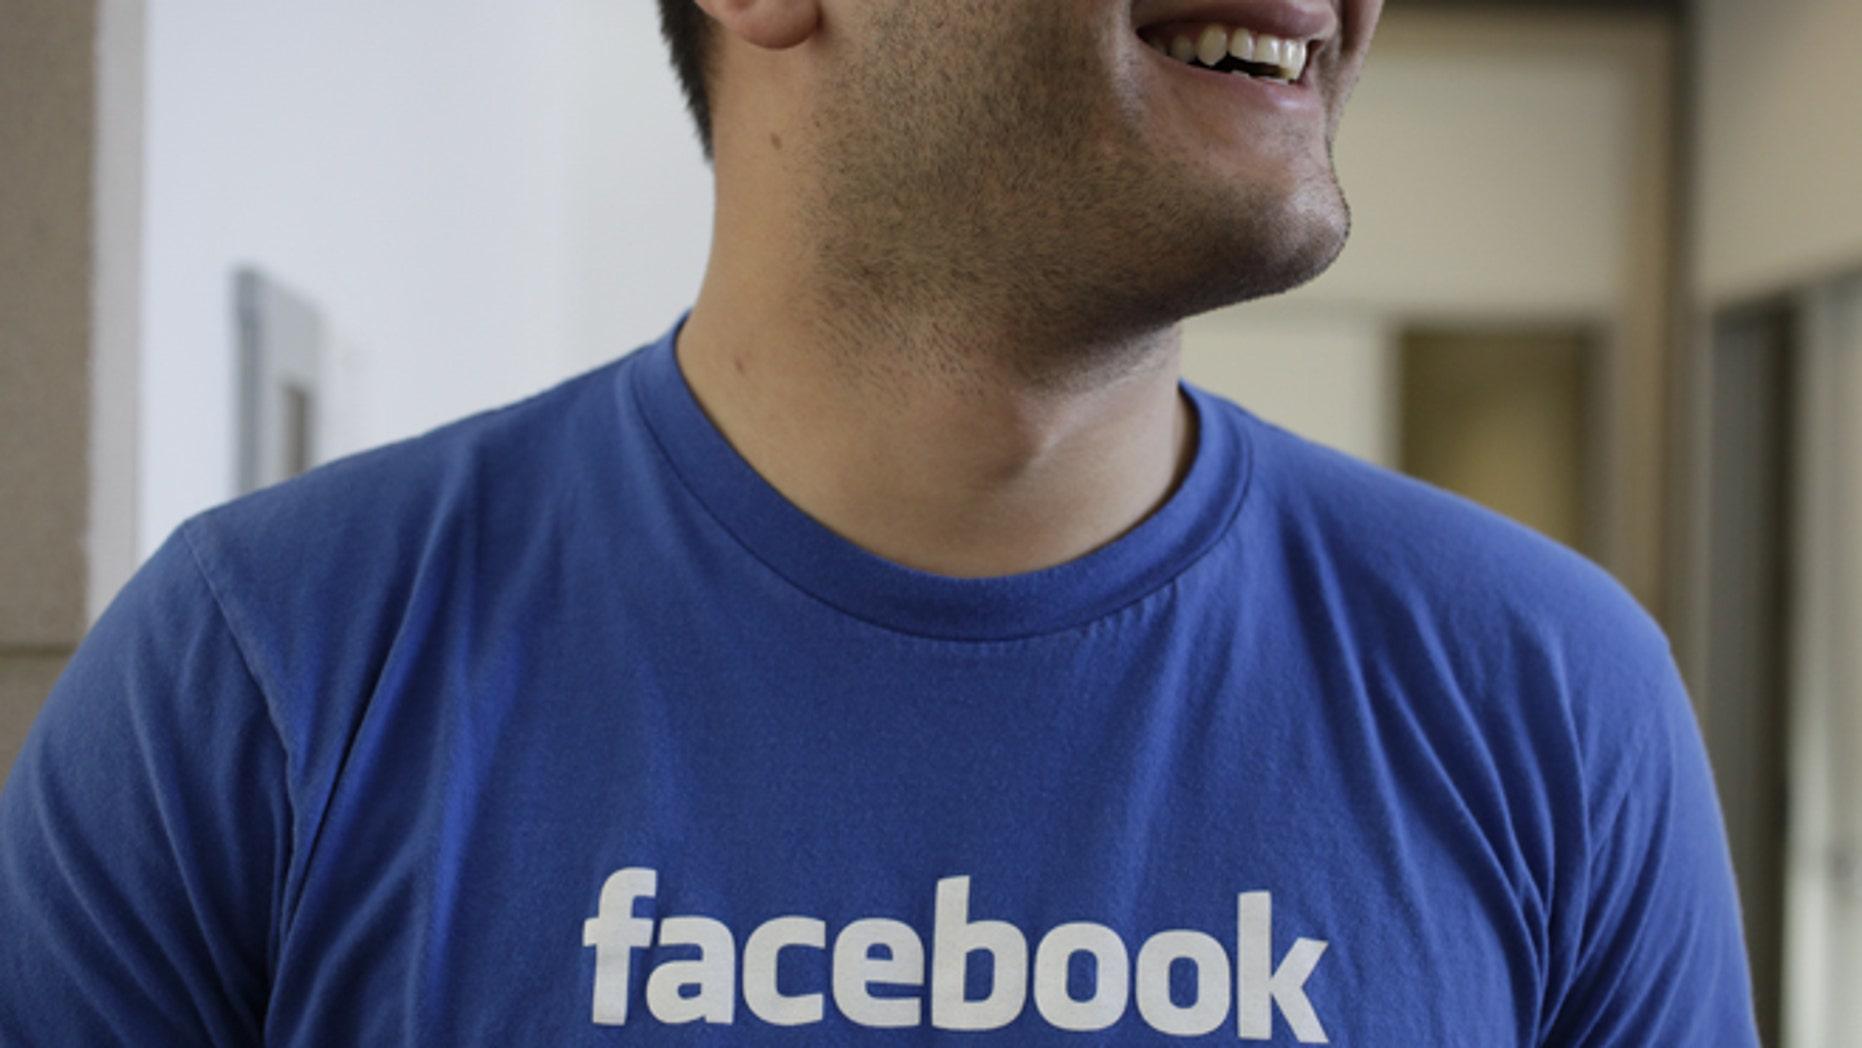 Feb. 8, 2012: A Facebook worker smiles inside Facebook headquarters in Menlo Park, Calif.